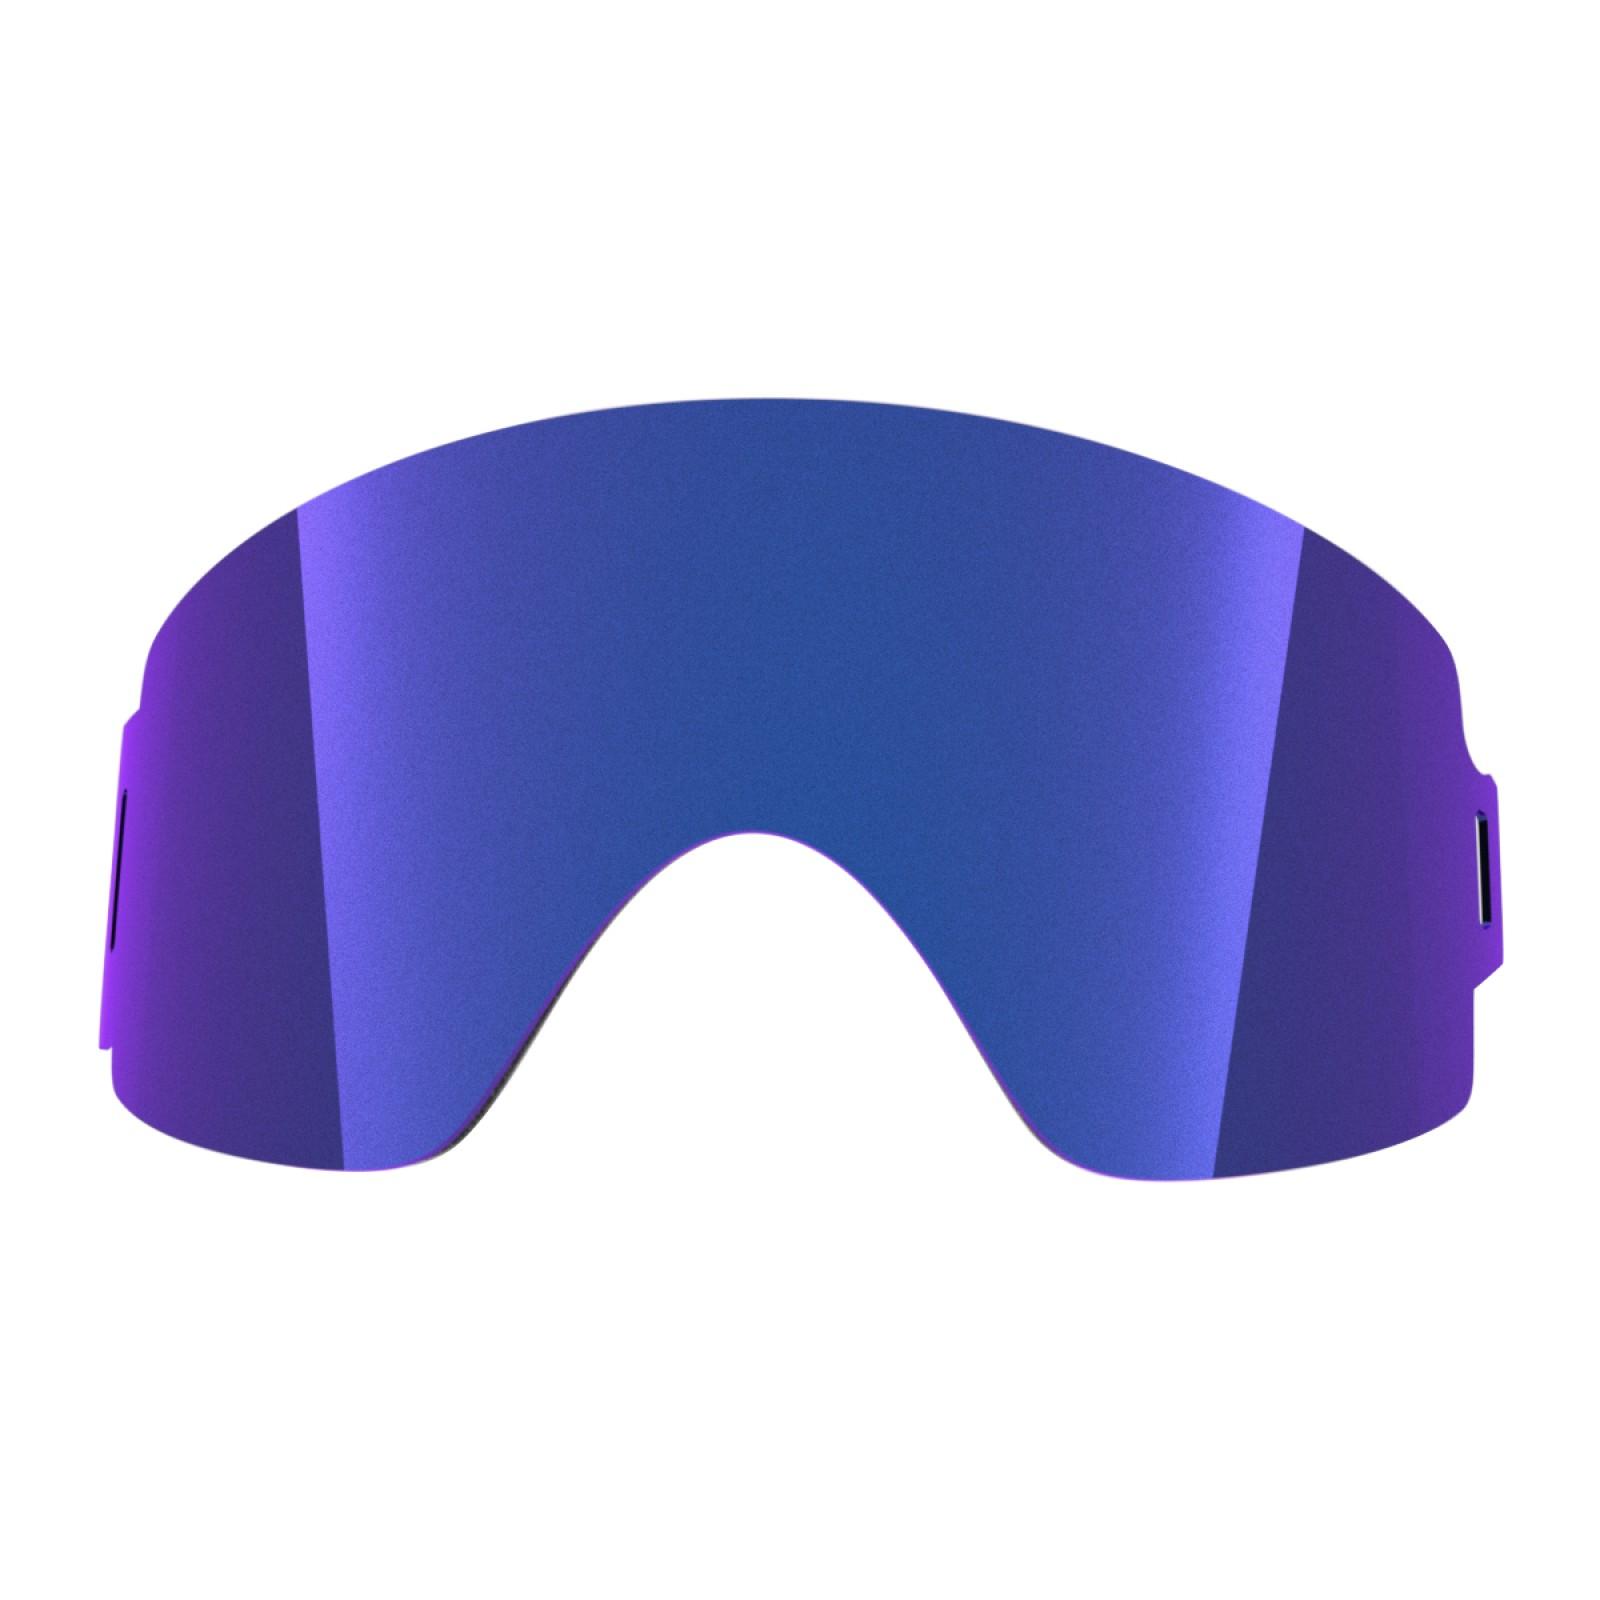 BLUE MCI lens for  Shift goggle